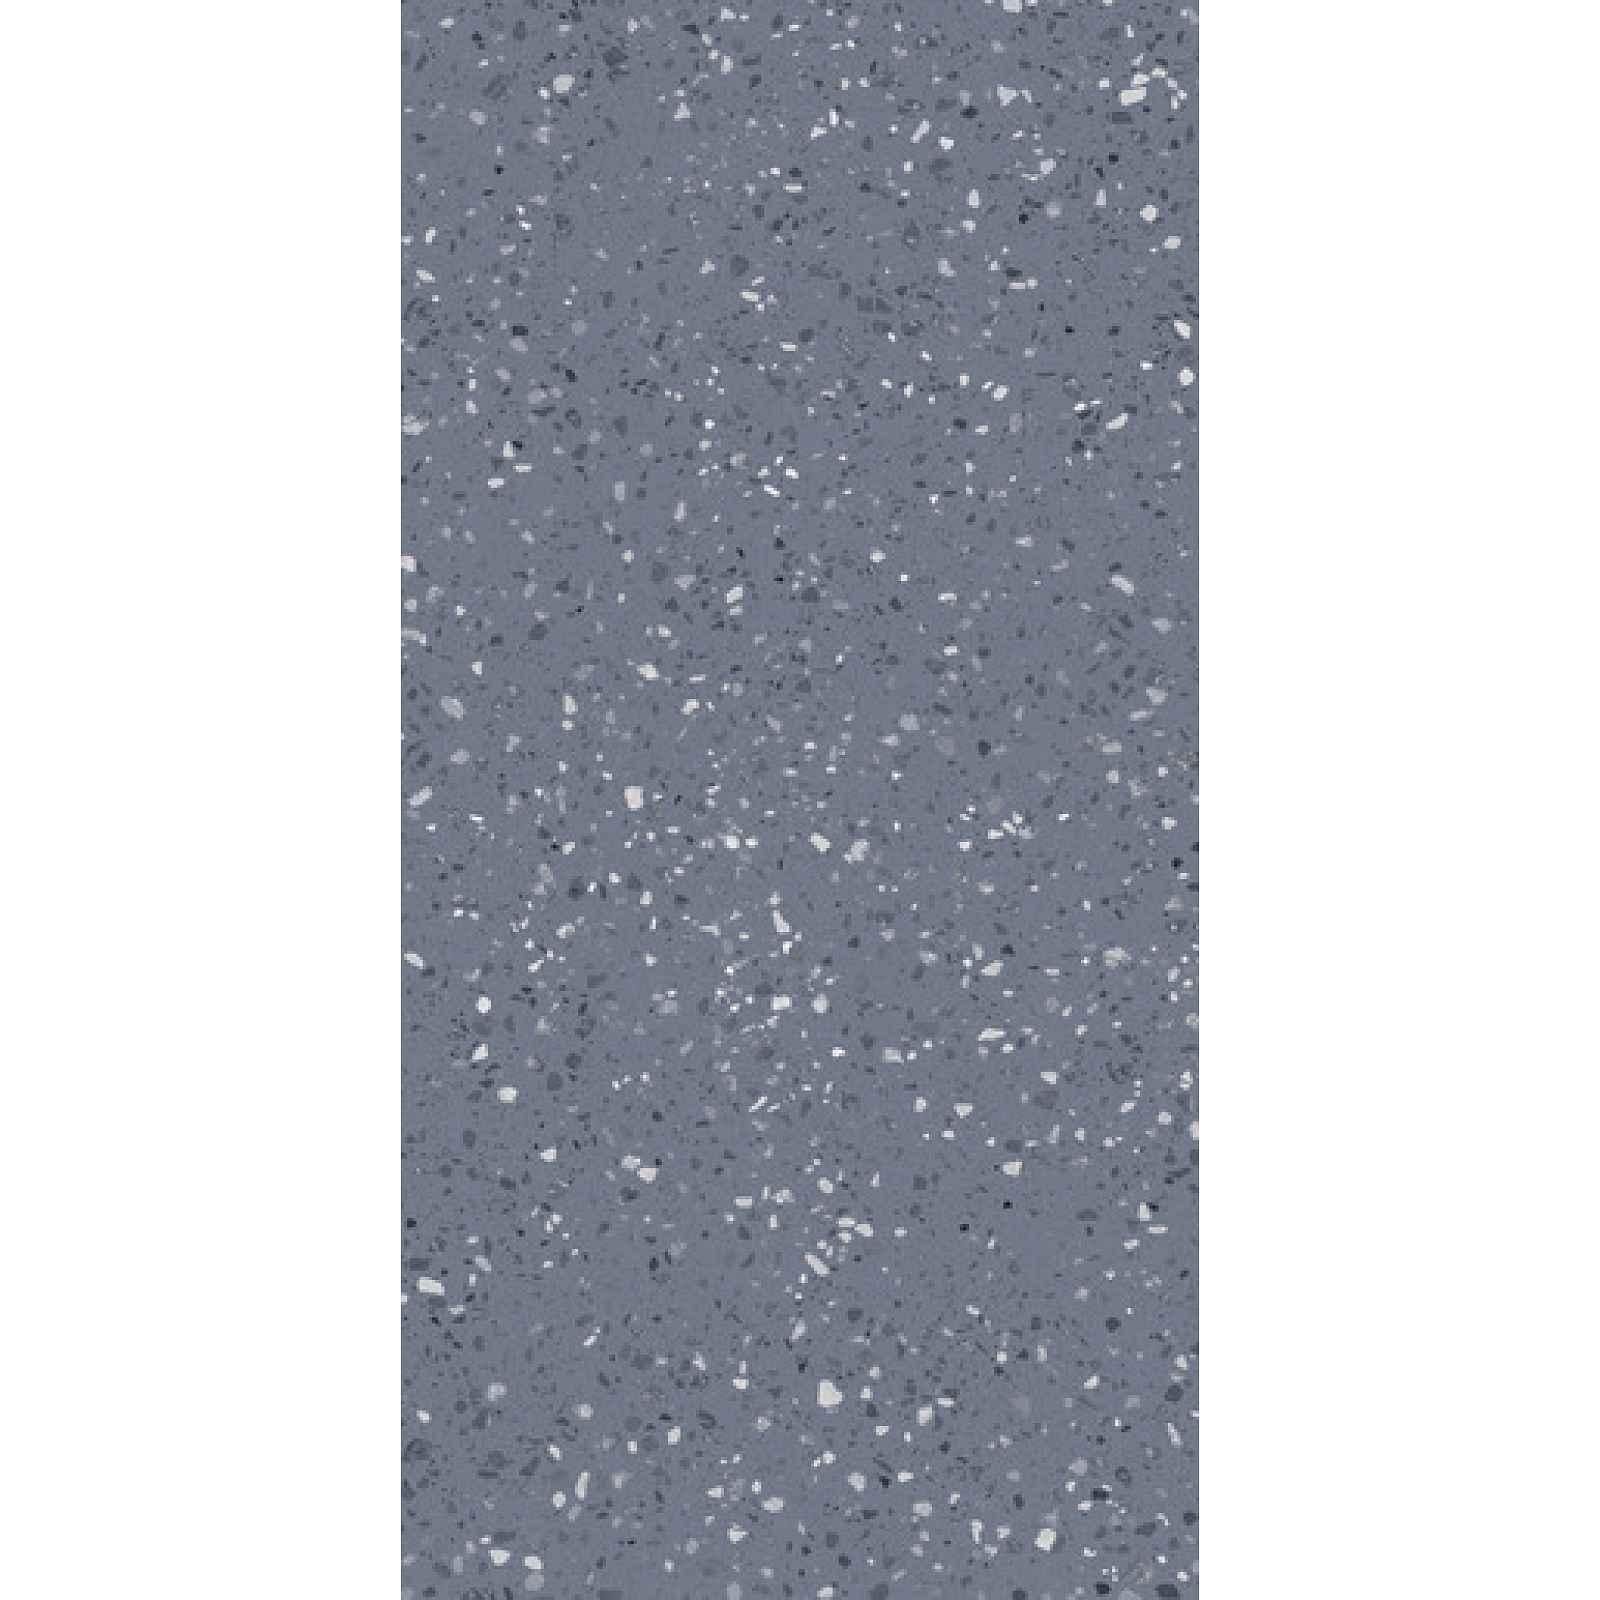 Dlažba RAKO Porfido modrá 60x120 cm mat / lesk DASV1815.1